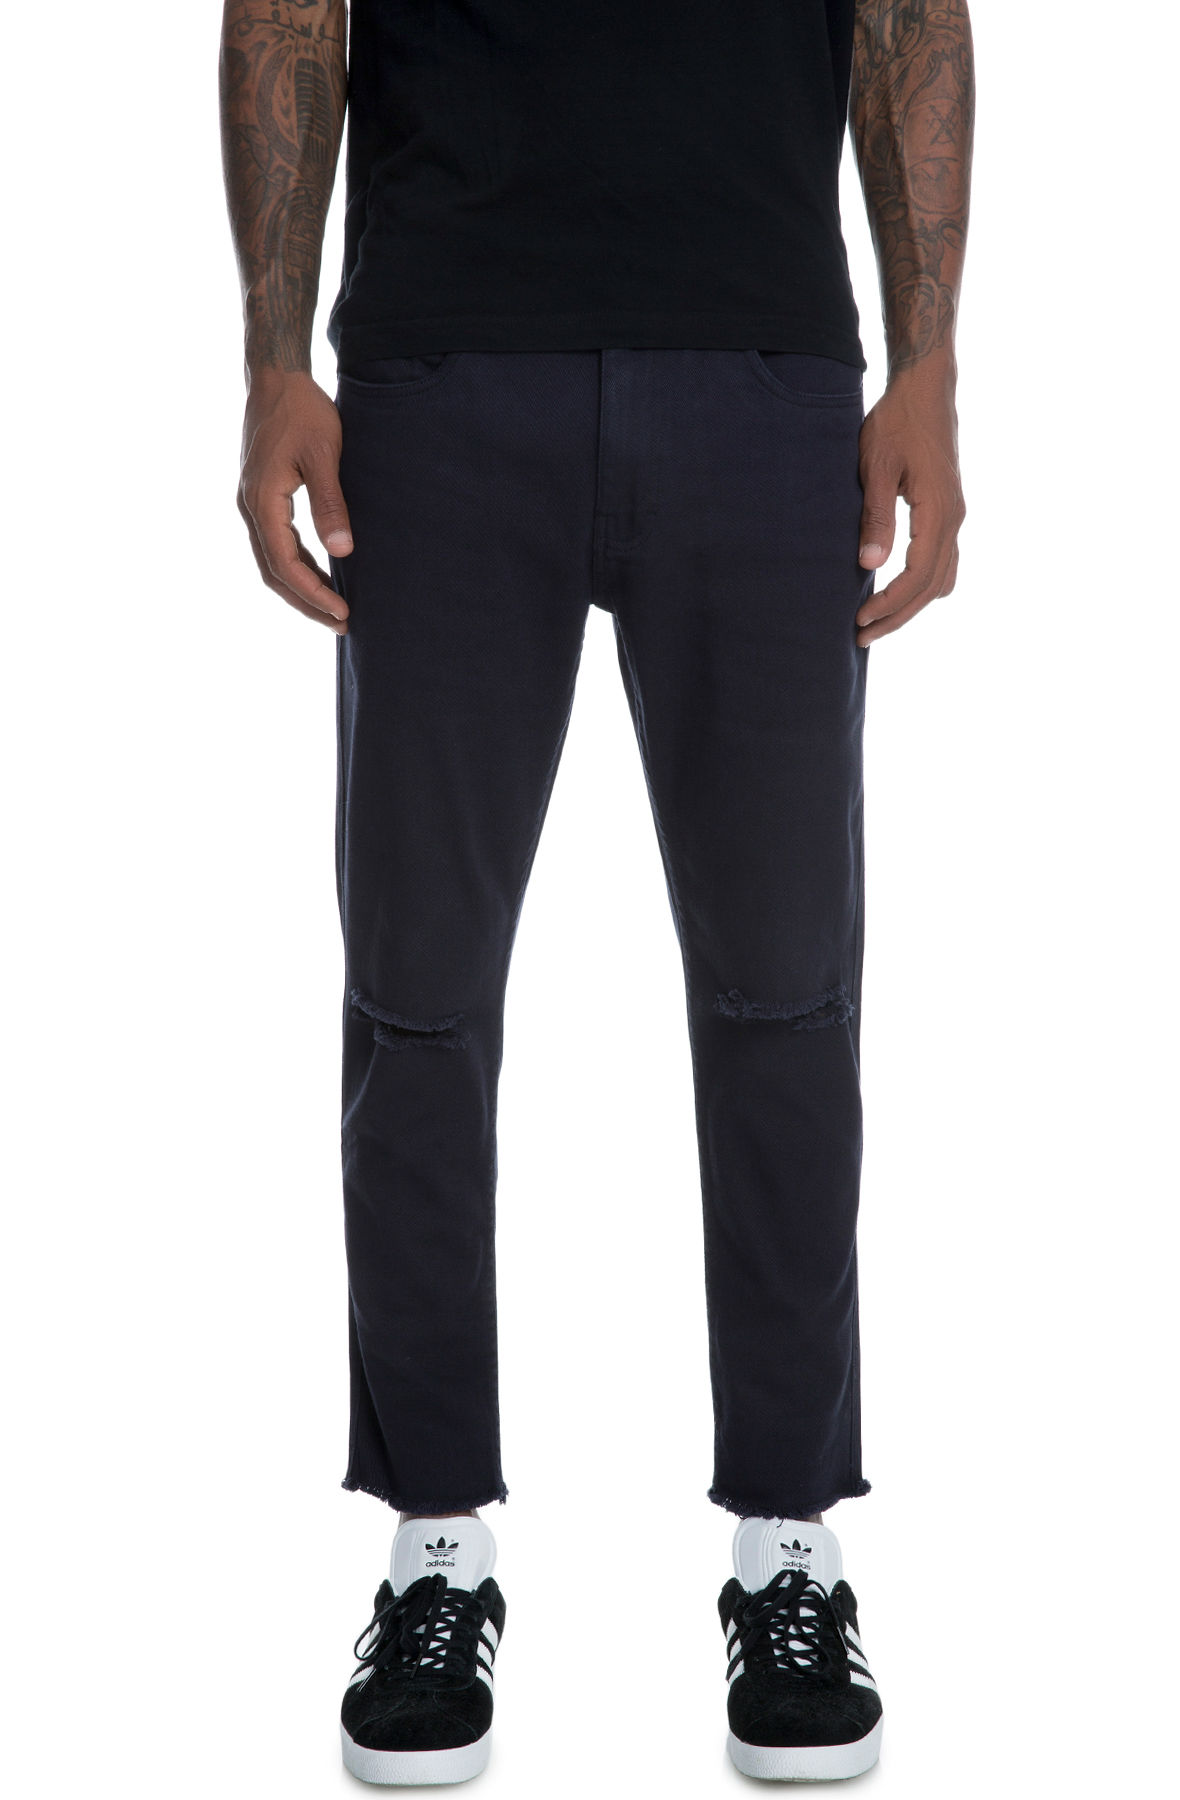 Image of The Stellan Pants in Navy